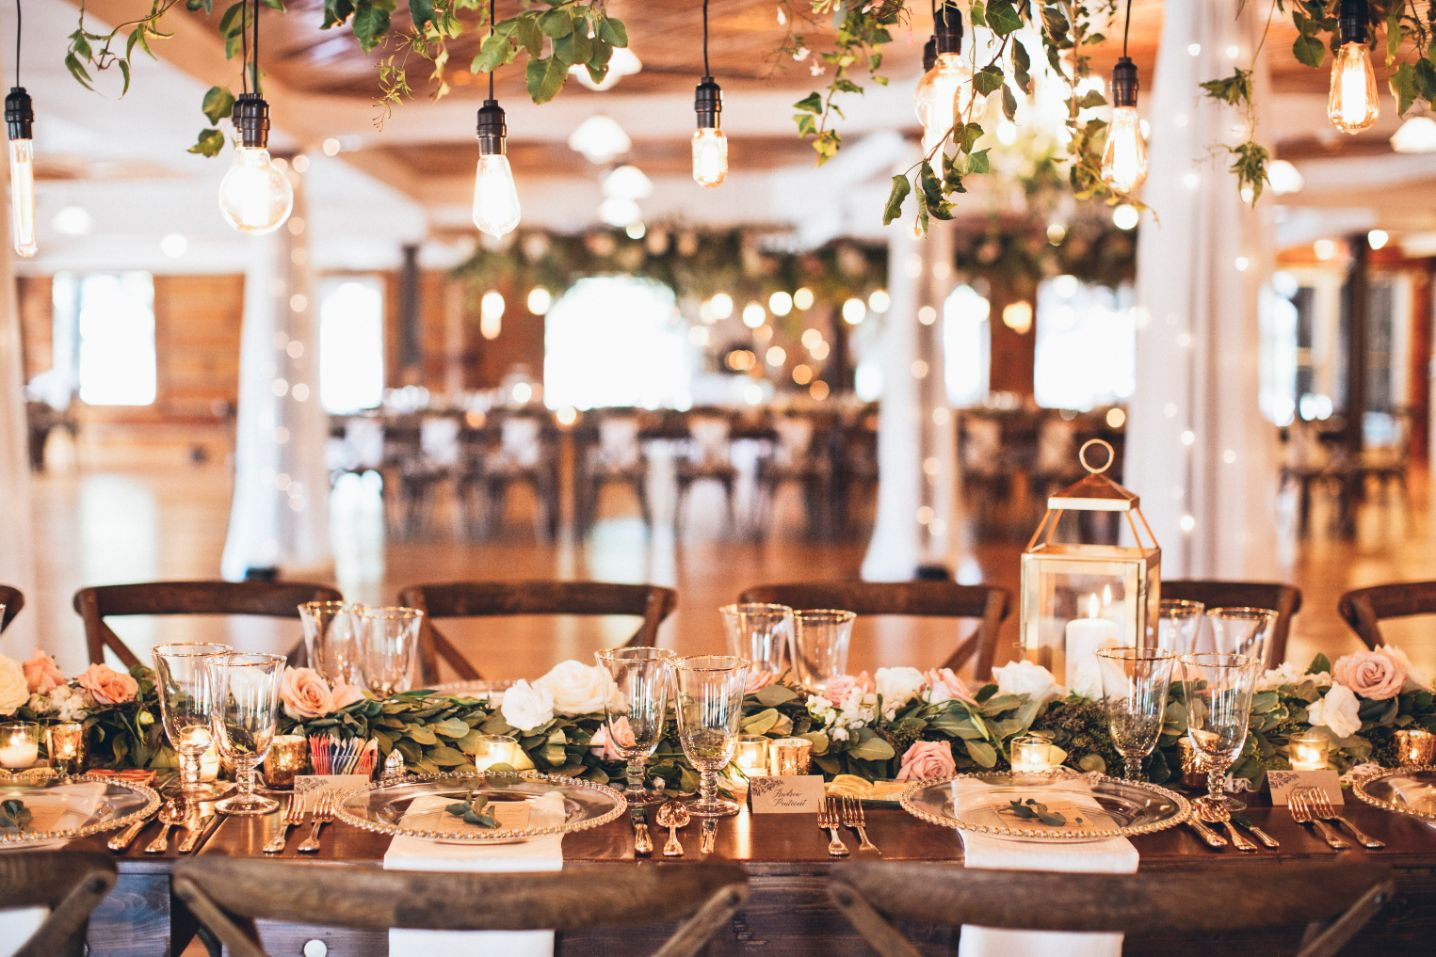 O00 Photos2017Iman Alodah 7.17.17 Miss Alysse Wedding Photography 44 nashville wedding venue lebanon tn tennessee wedding venue rustic overnight stay catering 1